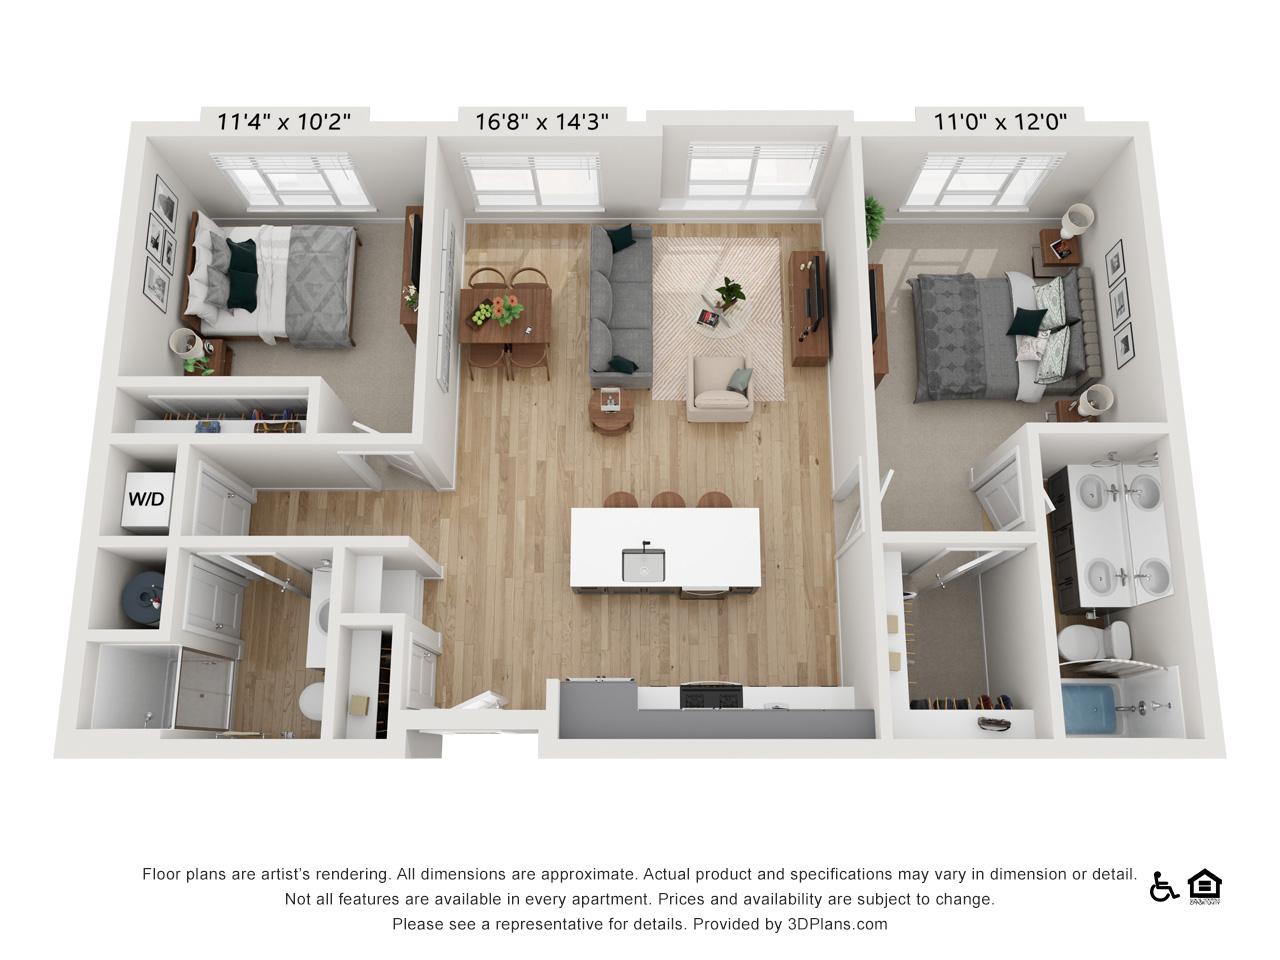 Two Bedroom E | 2 Bedrooms | 2 Bathrooms | 1,057-1,065 sq ft